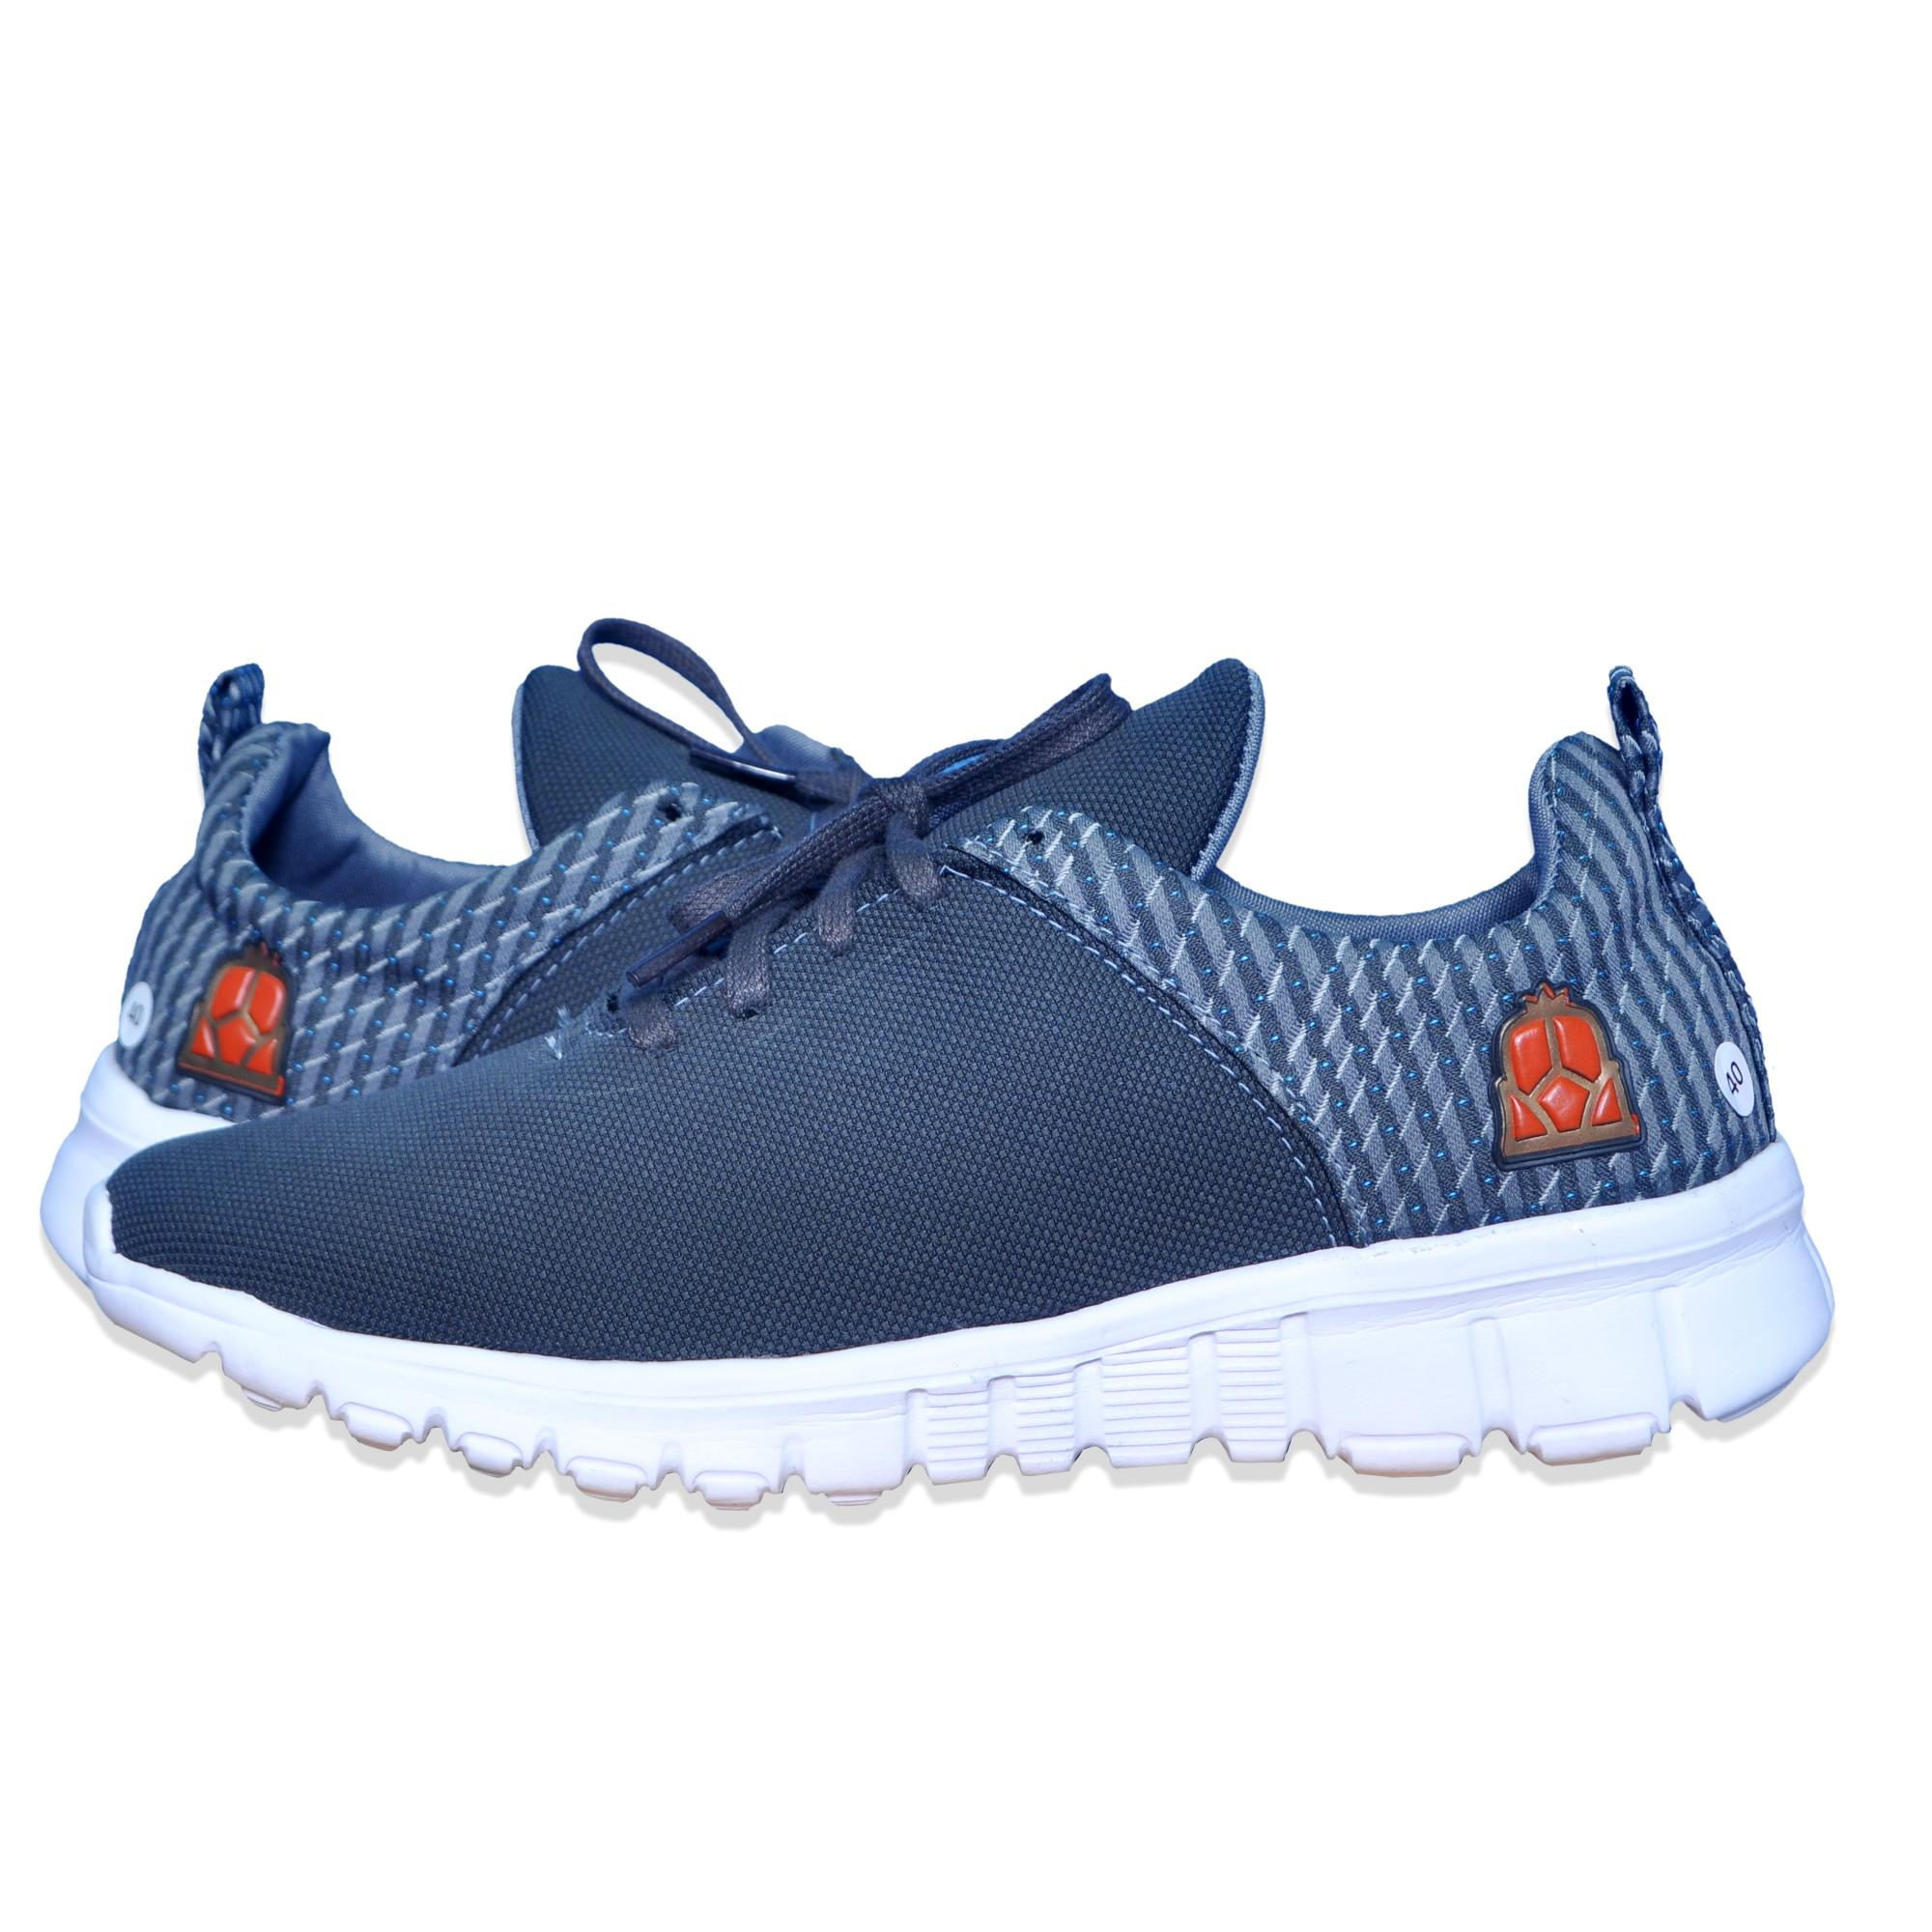 Sepatu Running original Sepatu Sneaker Sepatu Santae Sepatu Olaraga Sepatu Casual Pria